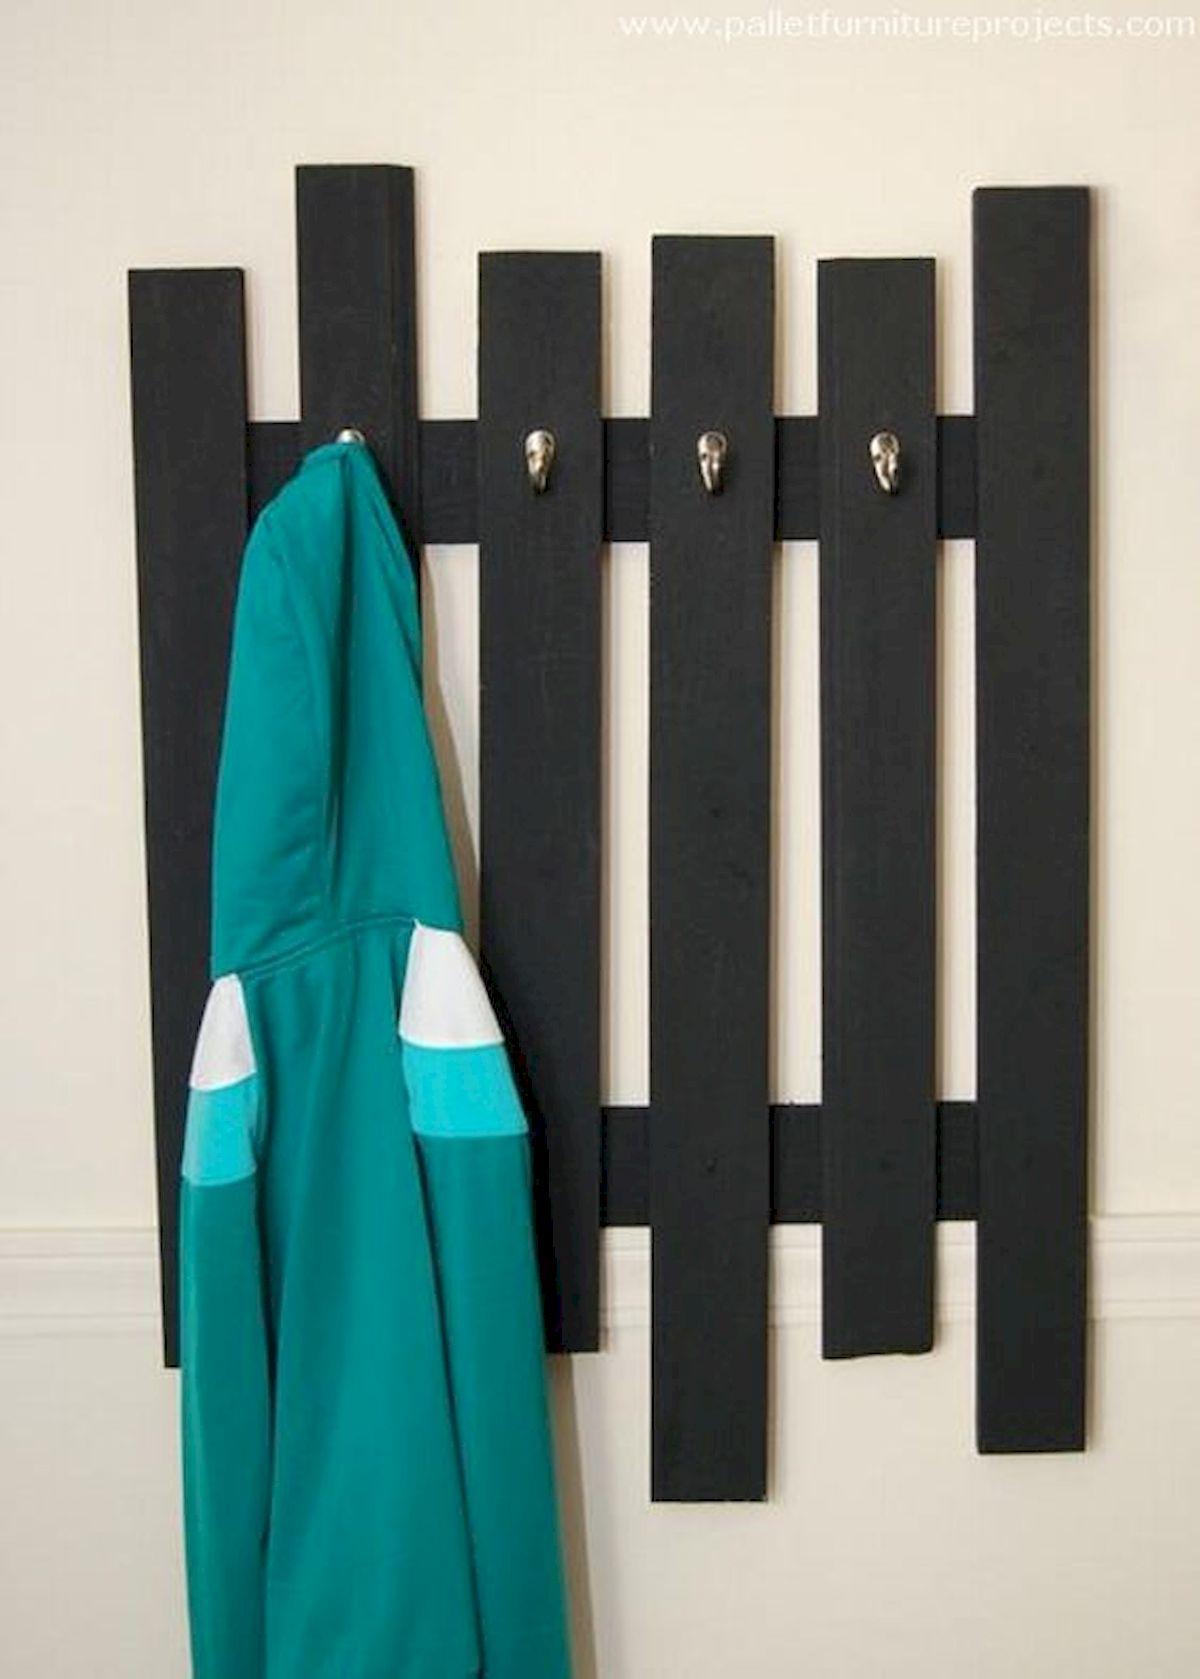 30 Fantastic DIY Hanger Ideas from Wooden Pallets (1)